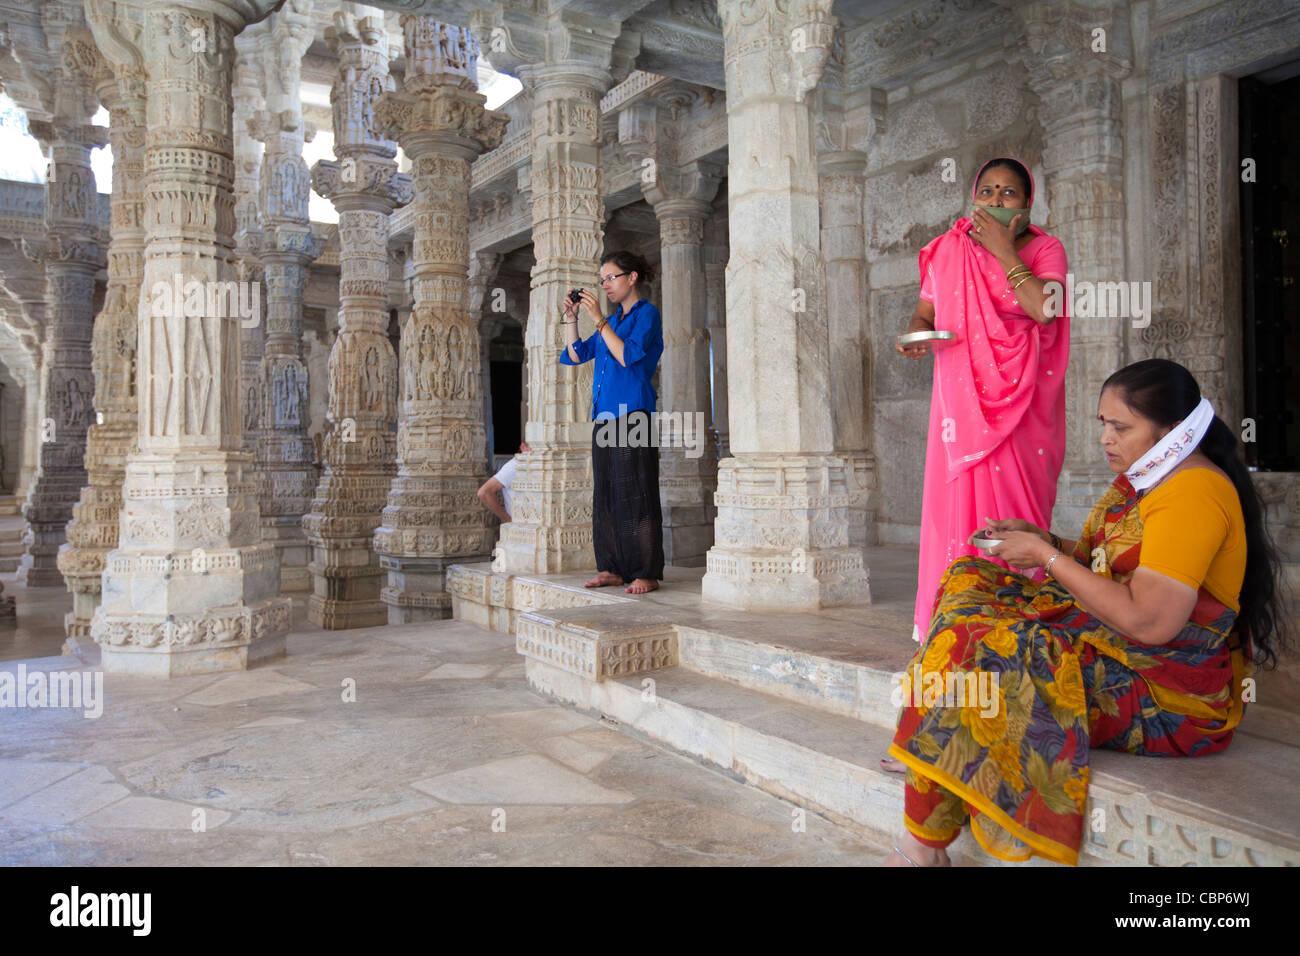 Jain pilgrims with traditional masks at The Ranakpur Jain Temple at Desuri Tehsil in Pali District, Rajasthan, India - Stock Image